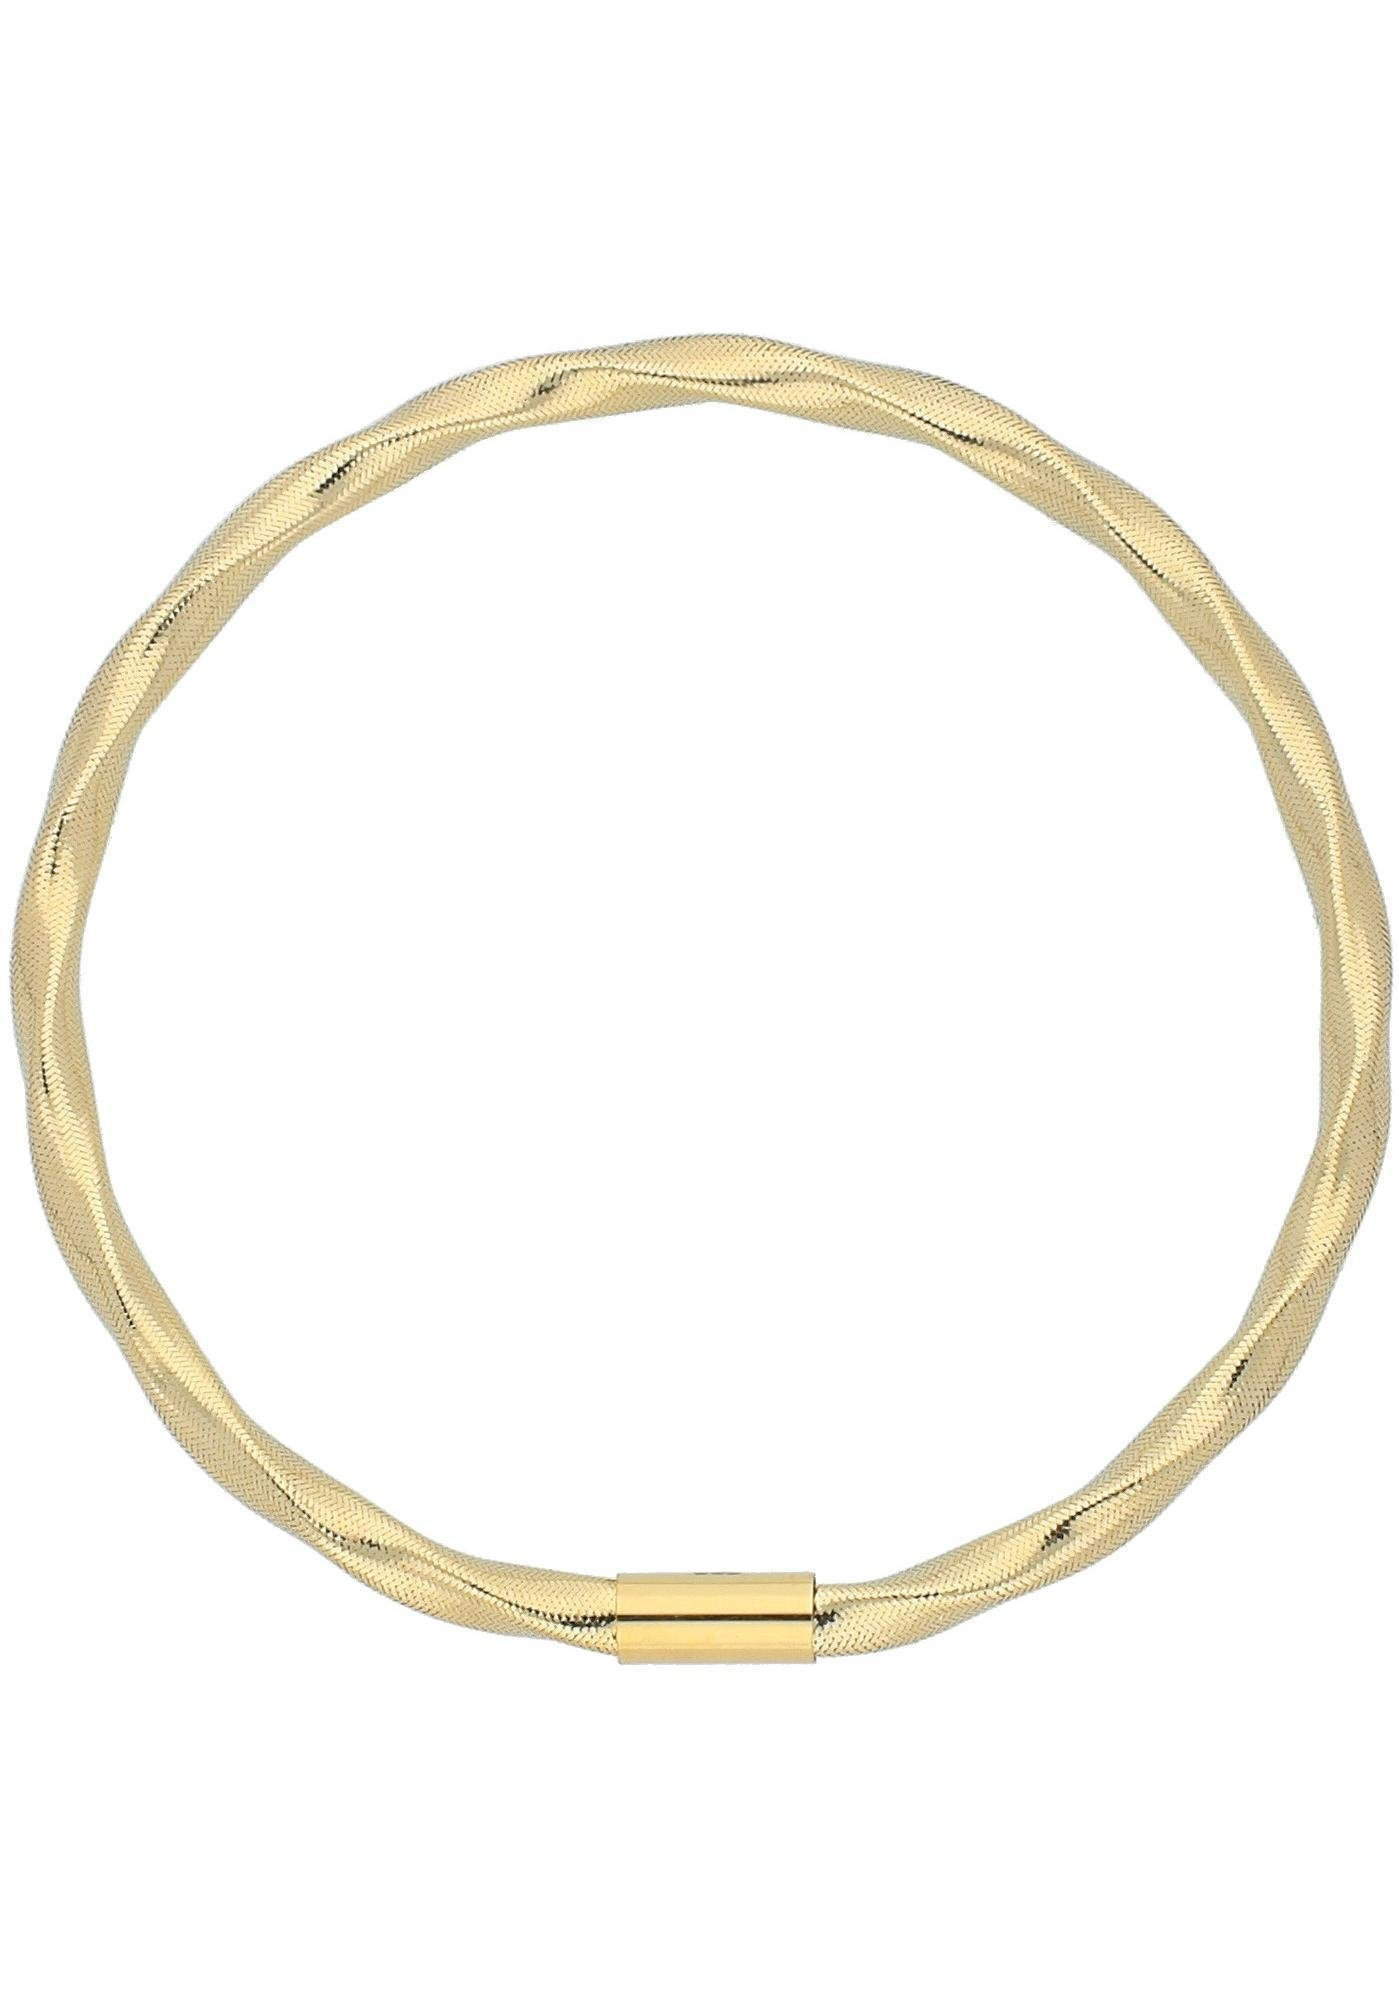 Firetti armband bij OTTO online kopen